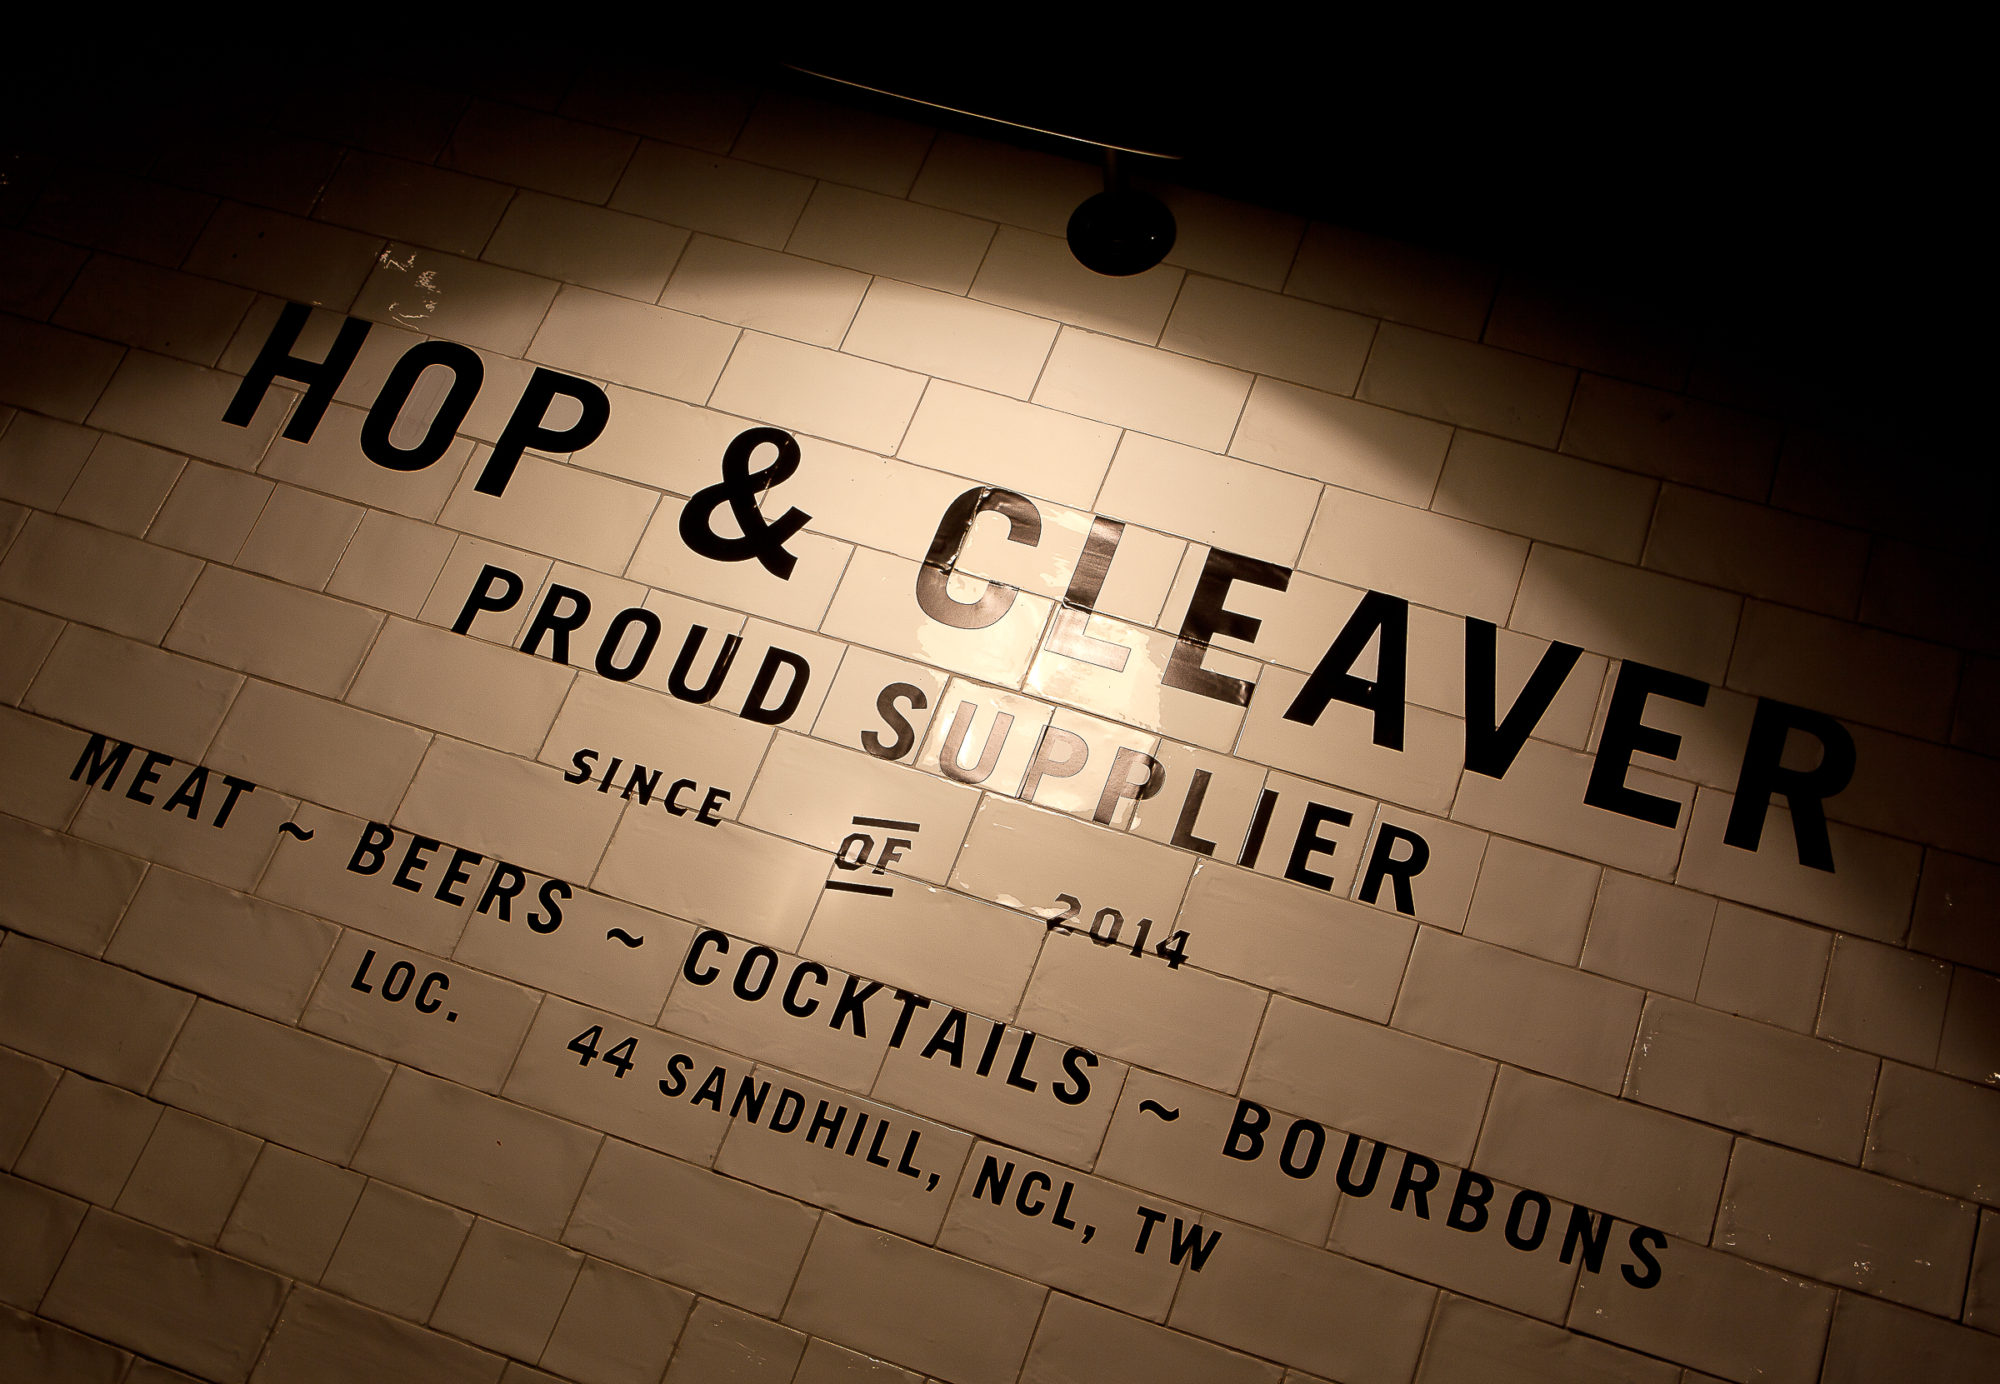 Hop & Cleaver